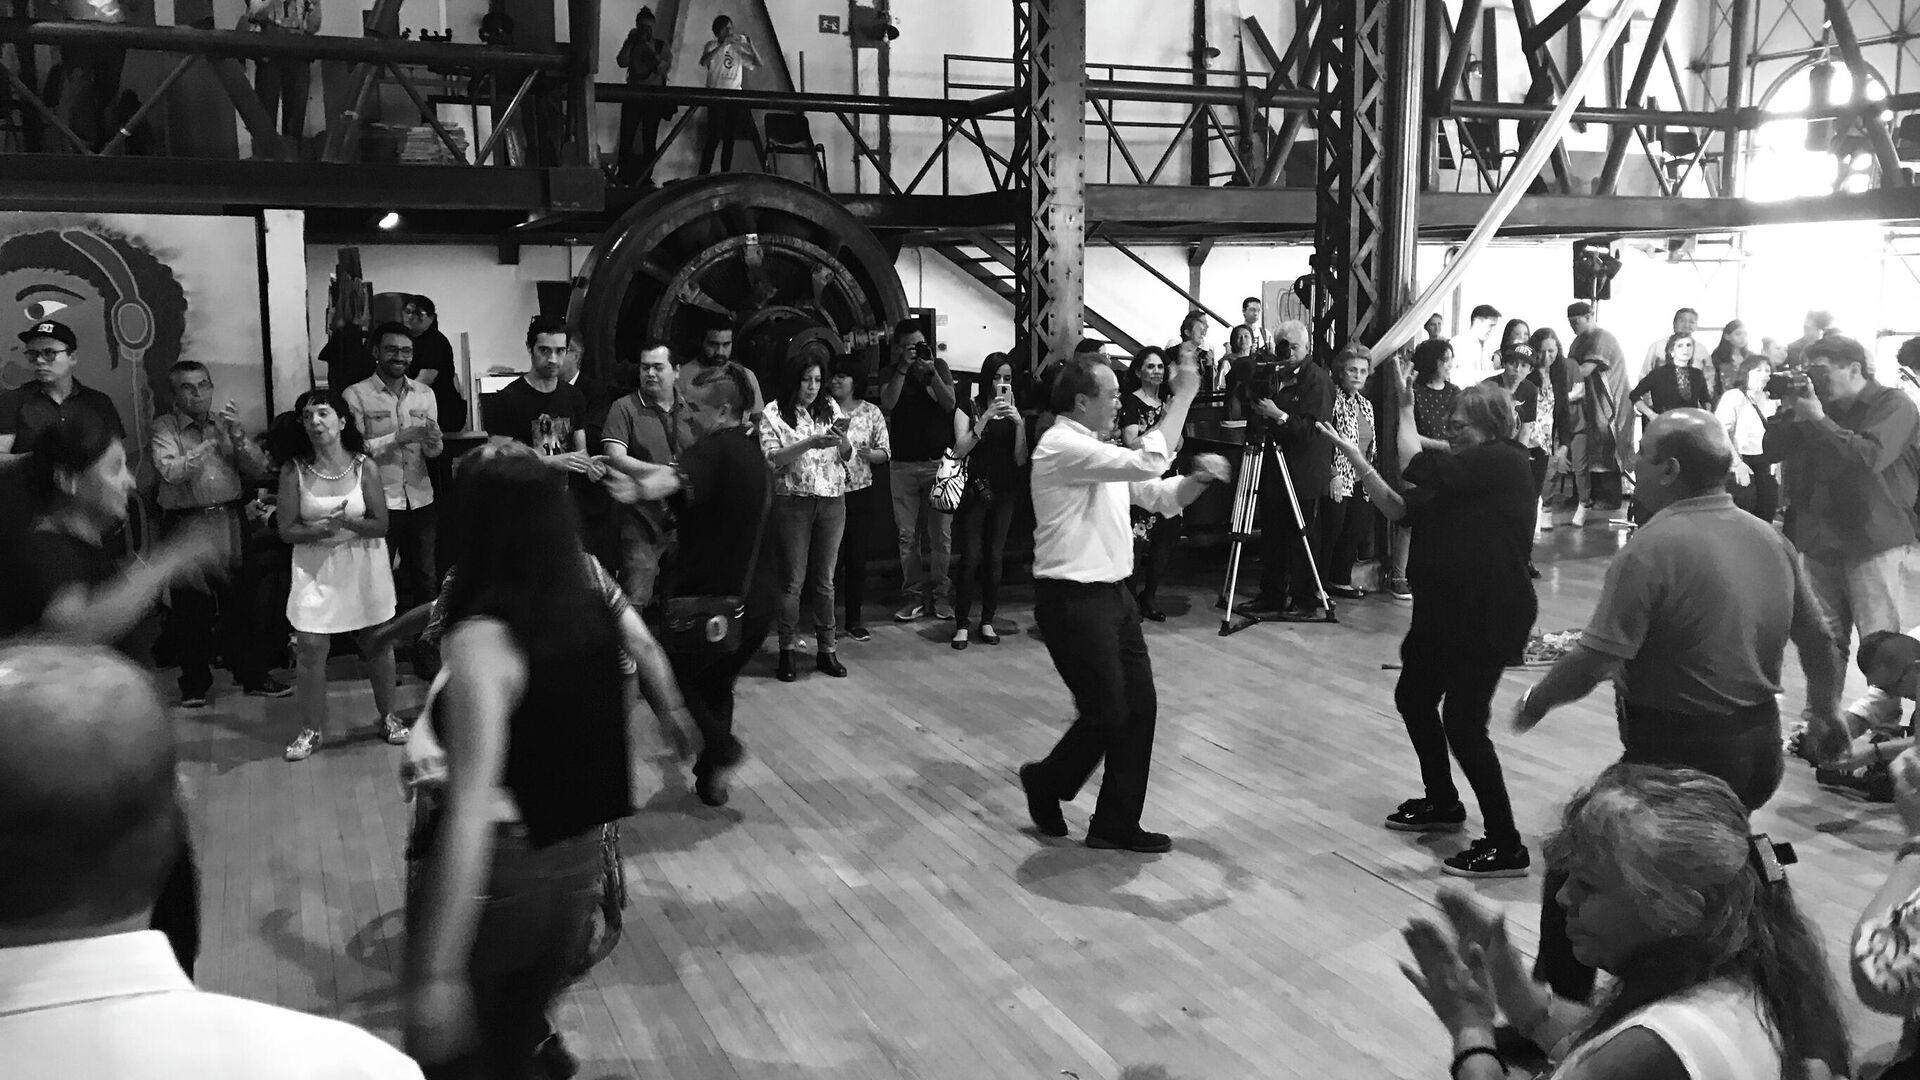 Yo-Yo Ma baila en La Nana, en la colonia Guerrero, de la CDMX, como parte de en evento comunitario - Sputnik Mundo, 1920, 17.07.2021